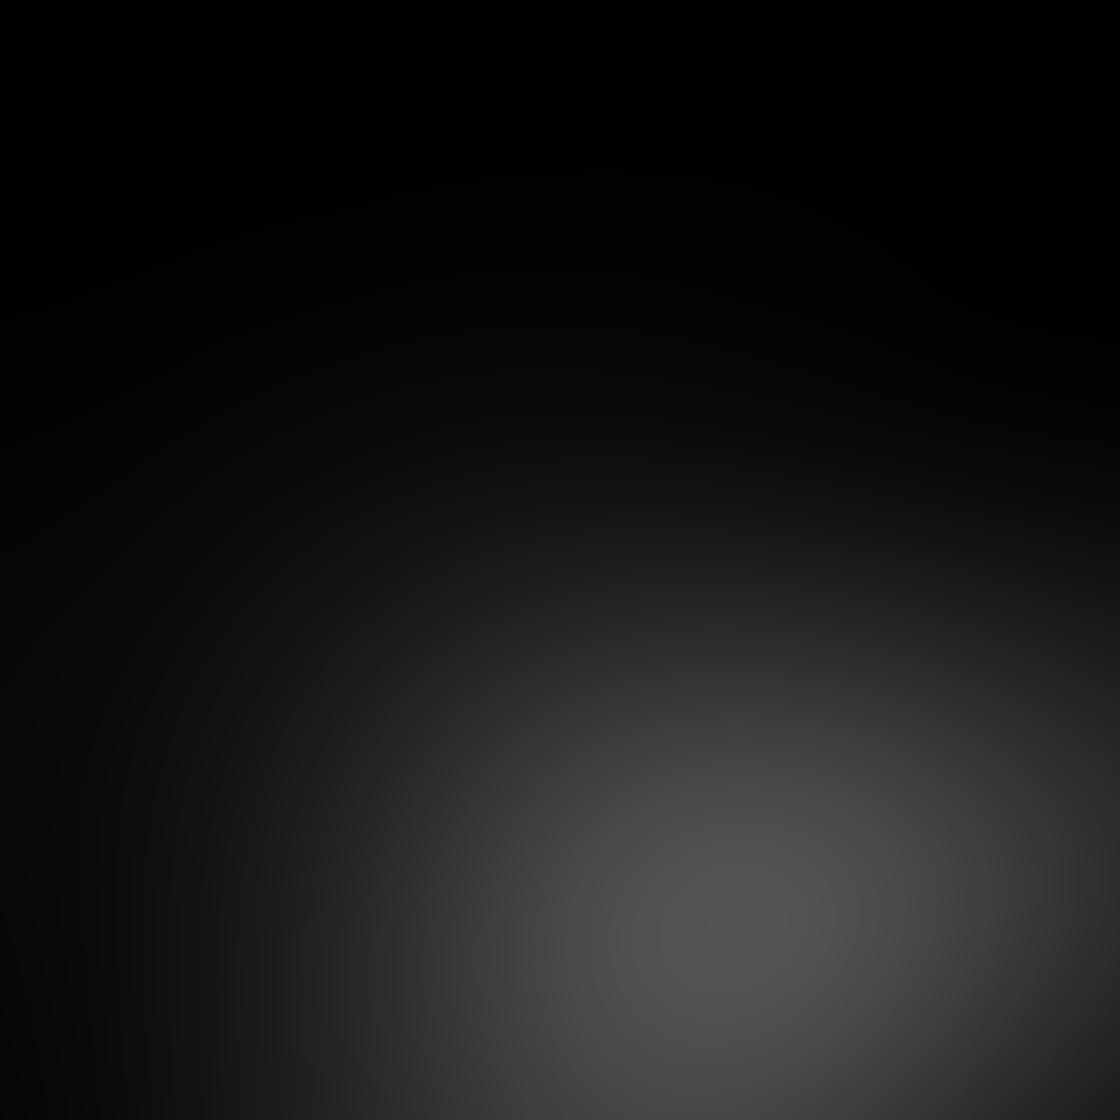 iPhone Photo Exposure 8